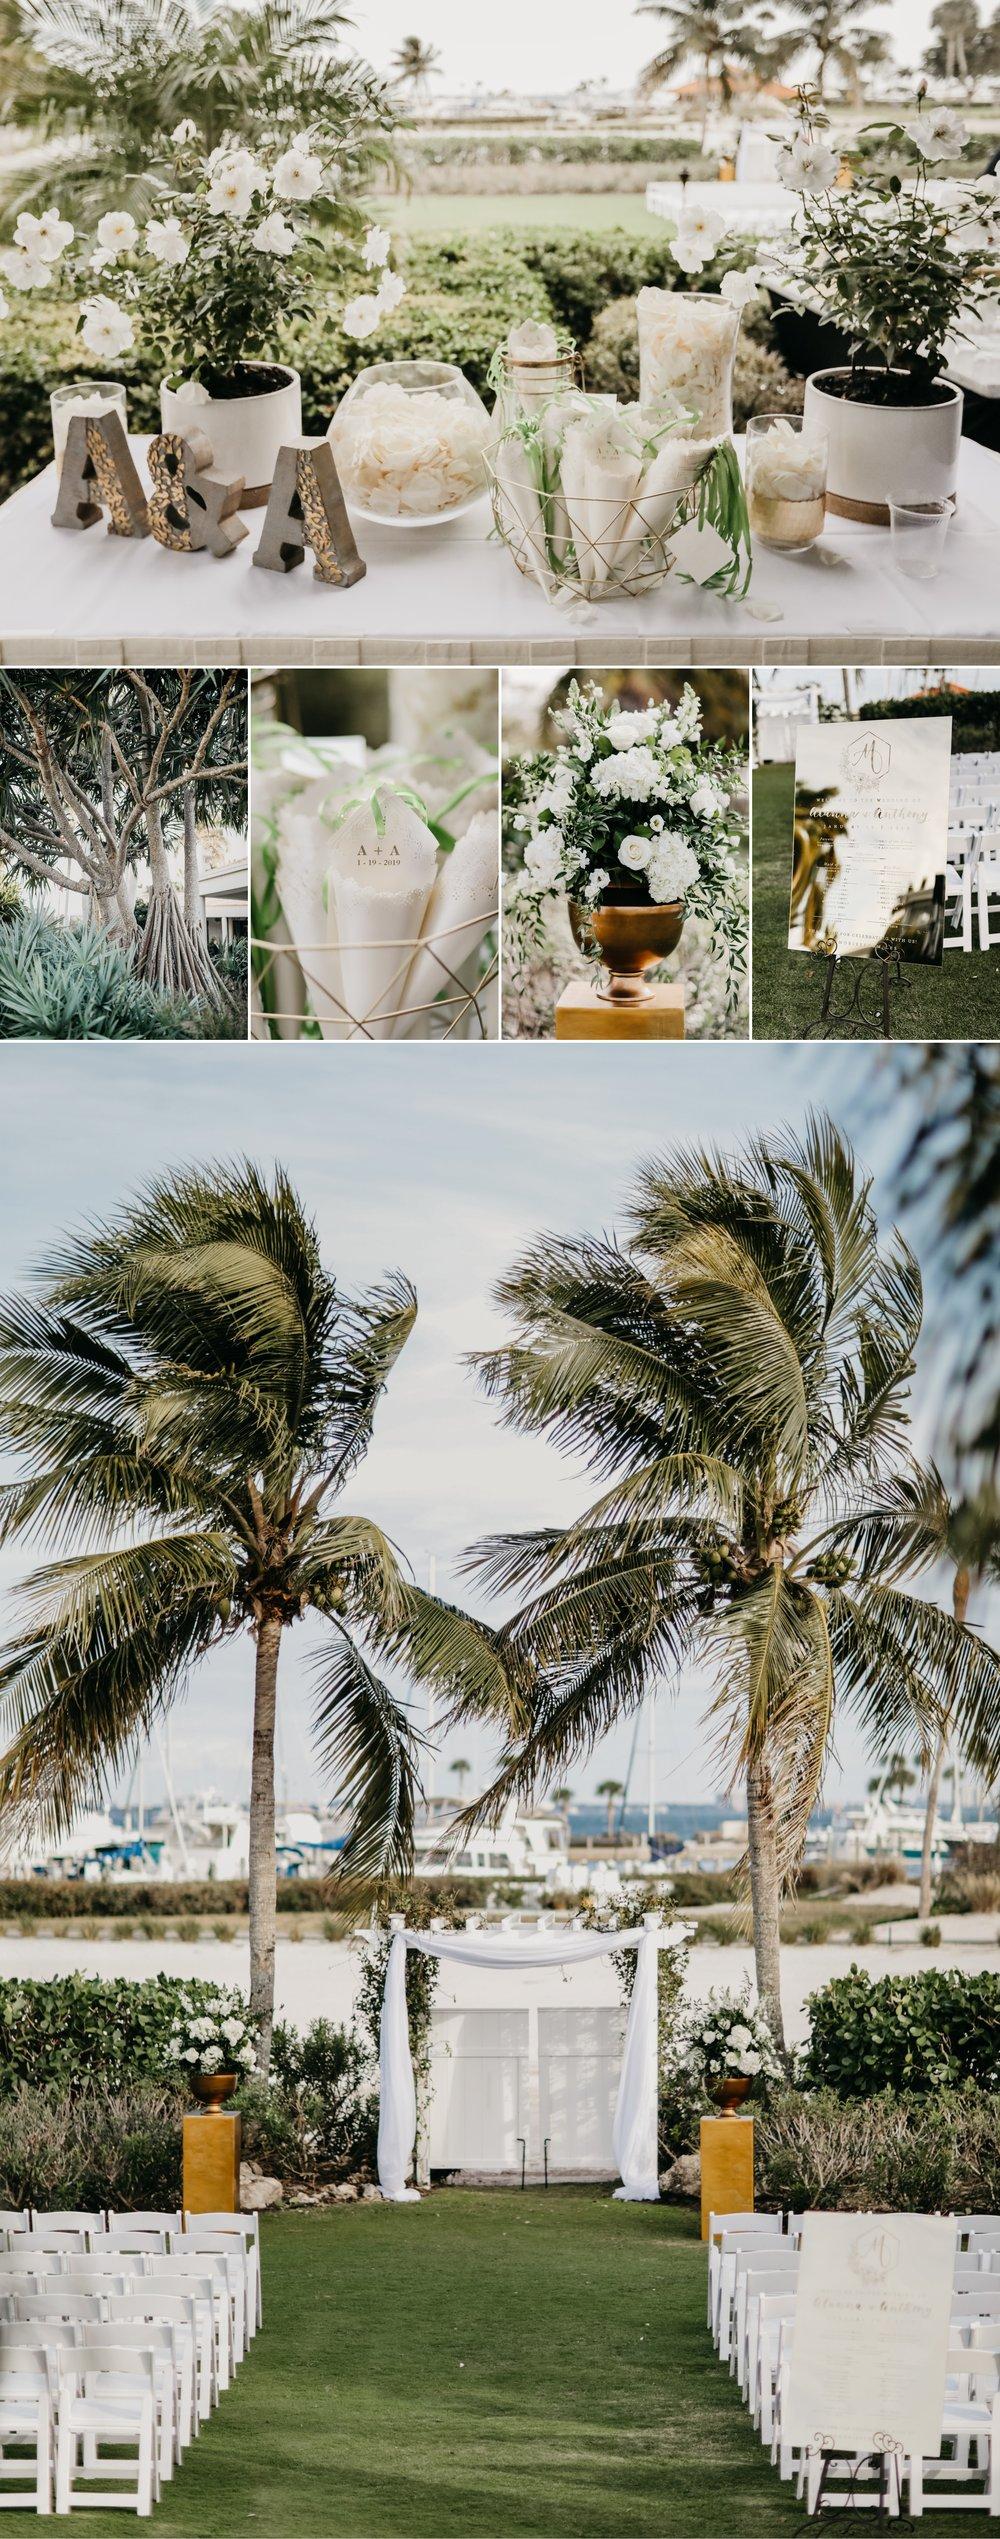 Luxe_tropical_travel_destination_wedding_photography_ShainaDeCiryan.com1.jpg